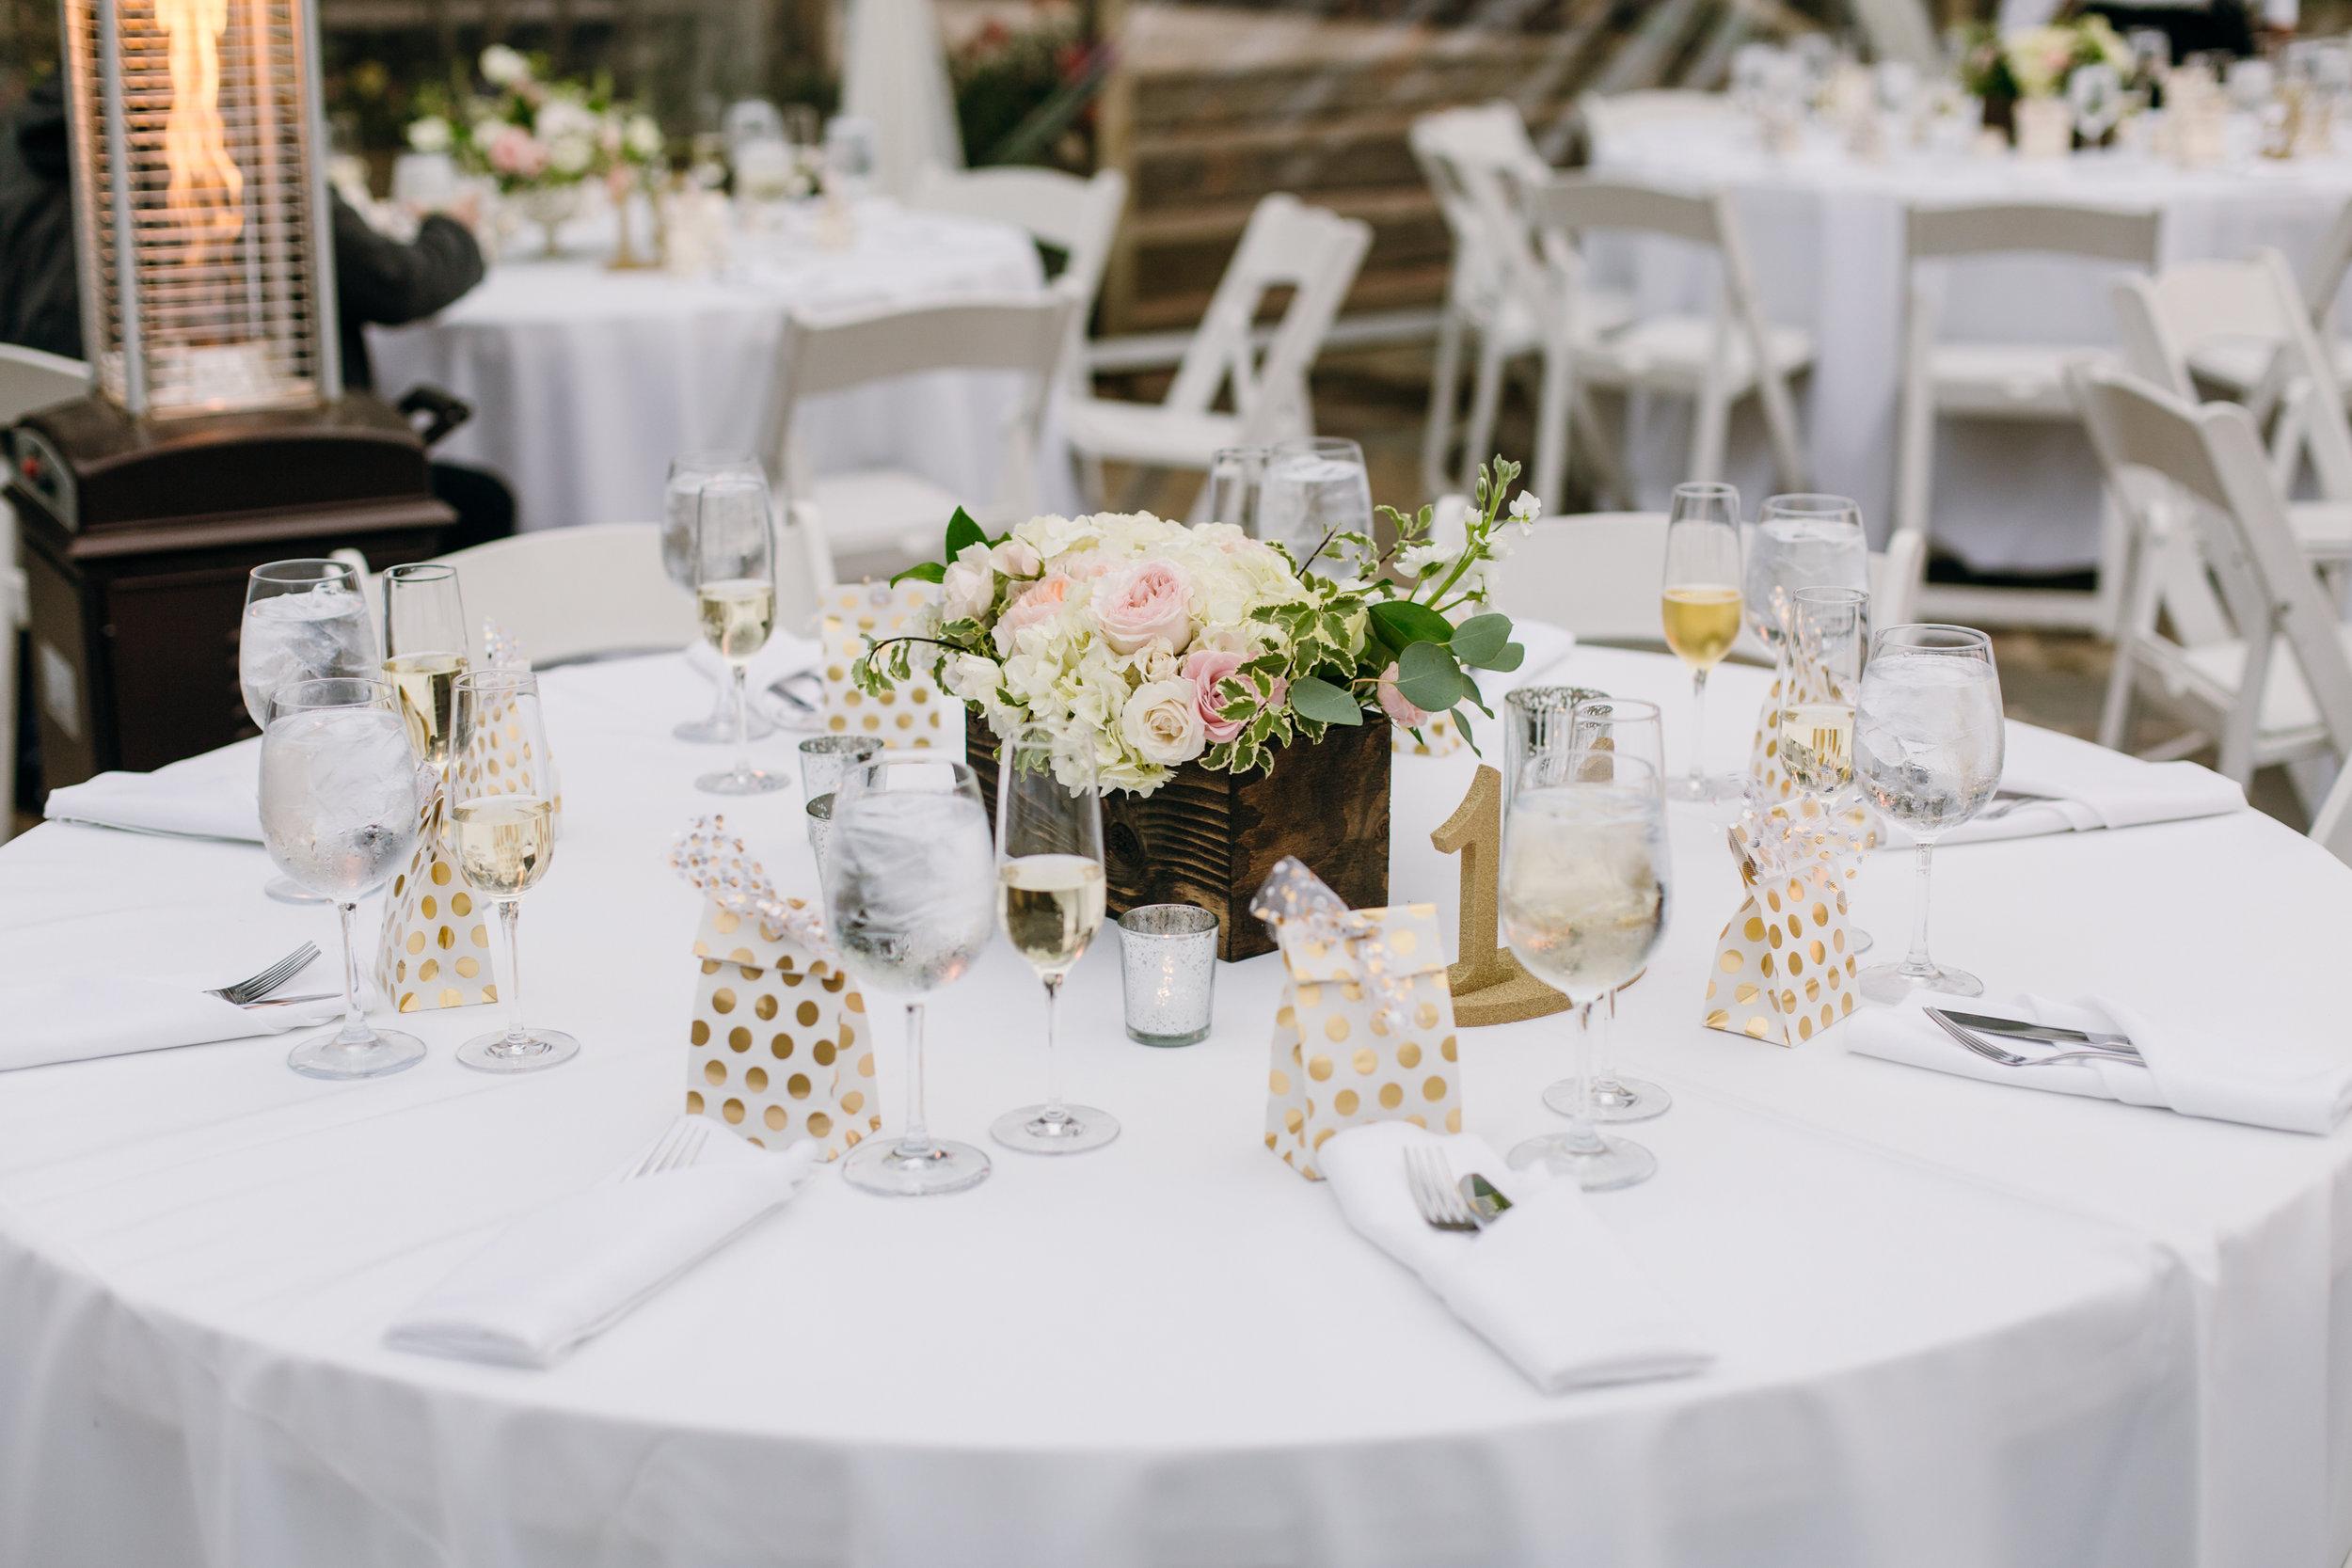 KaraNixonWeddings-LakeOakMeadows-Temecula-Wedding-39.jpg